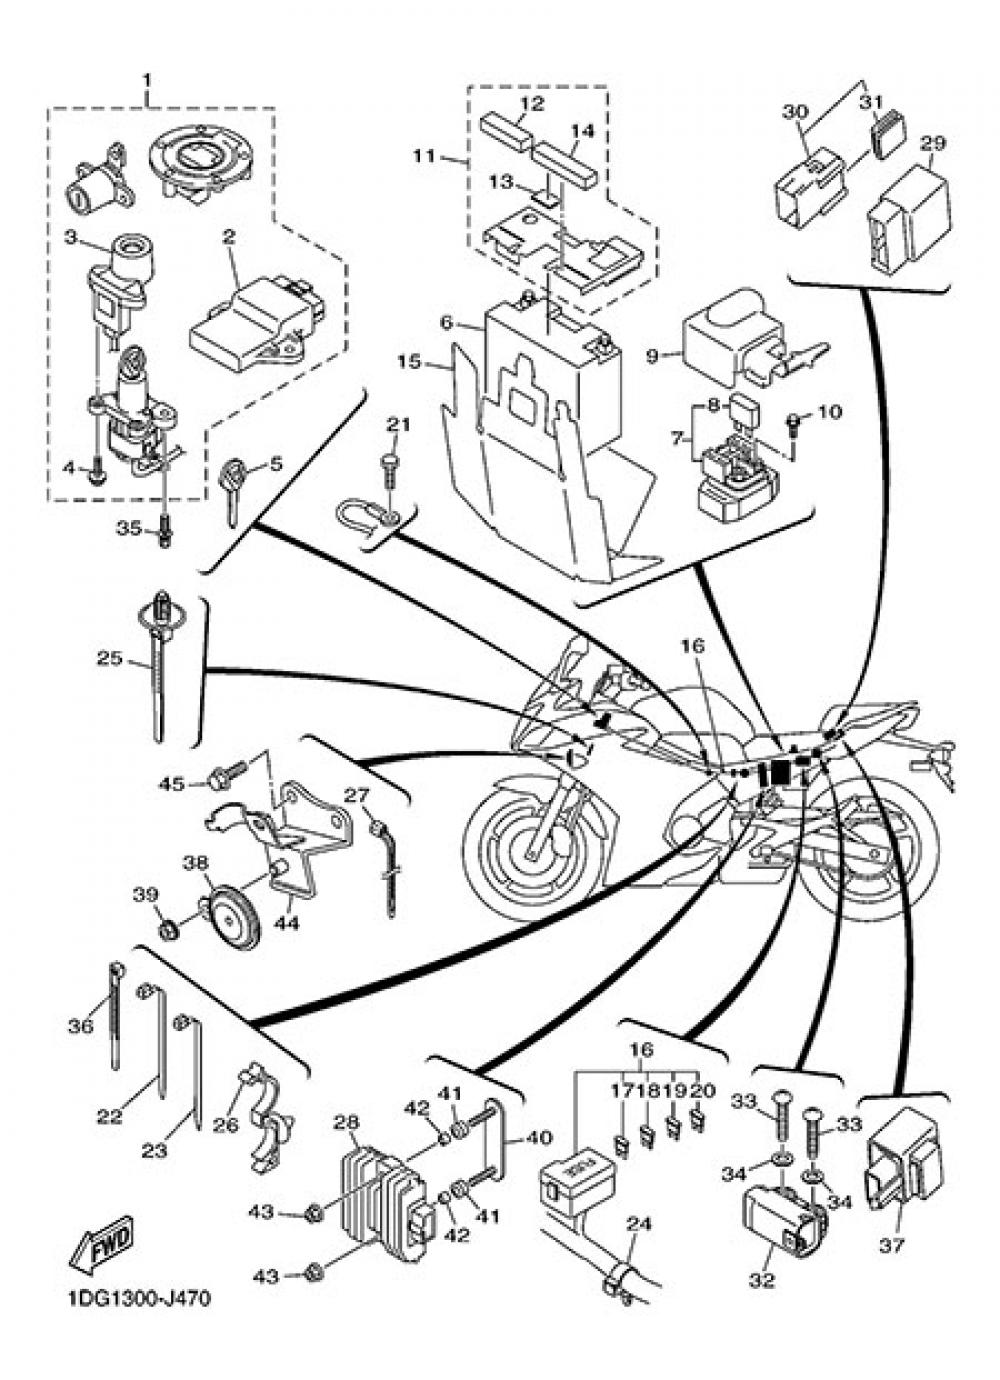 ELECTRIC EQUIPMENT 2 Yamaha XJ6 Diversion F ABS 2015